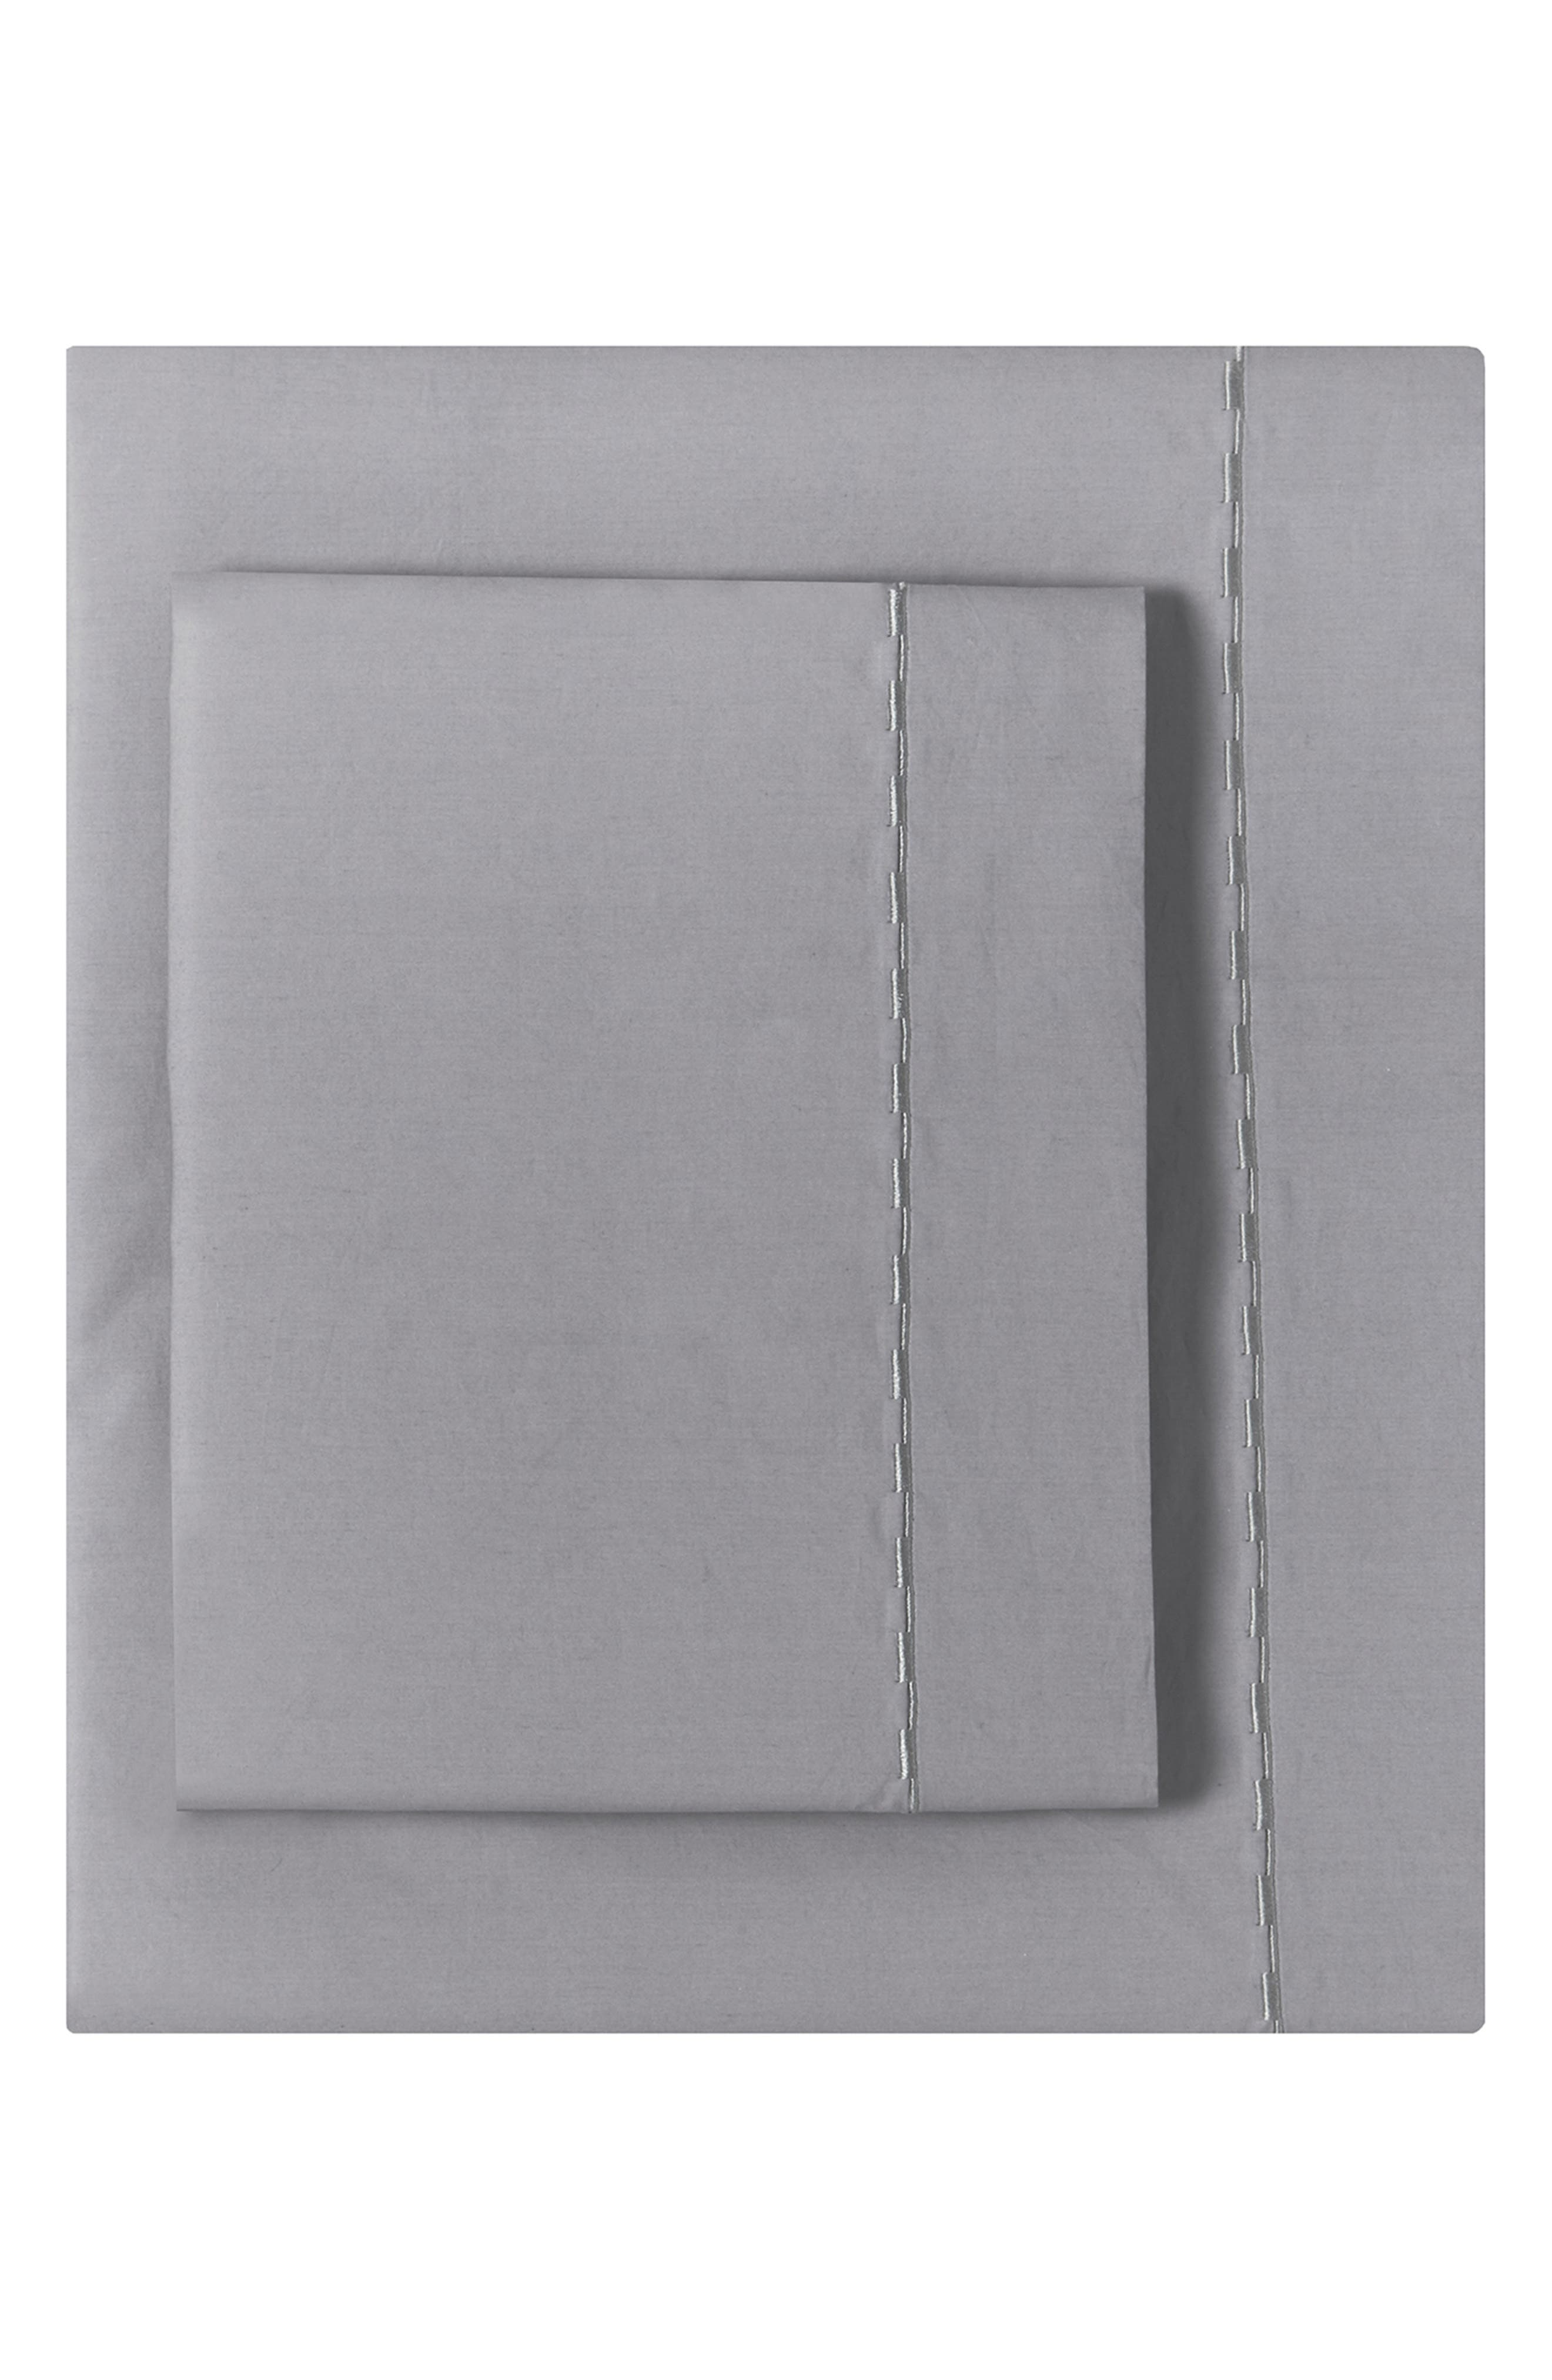 Cotton Percale Sheet Set,                             Main thumbnail 1, color,                             GREY-BLUE